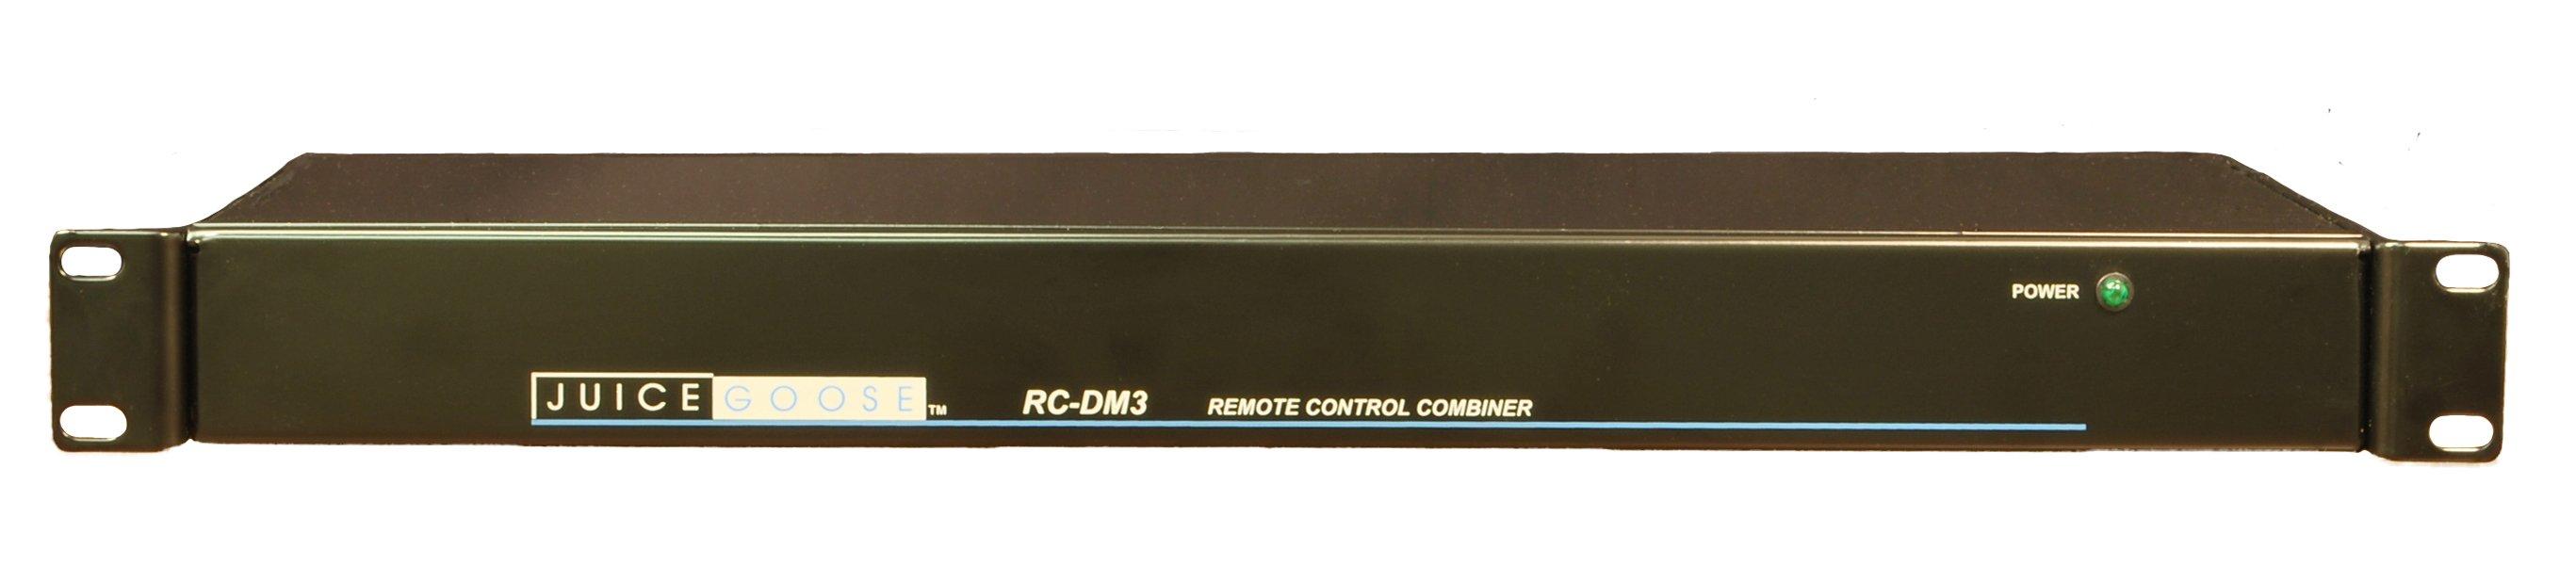 Juice Goose RCDM3  CQ Remote Combiner/Monitor  RCDM3